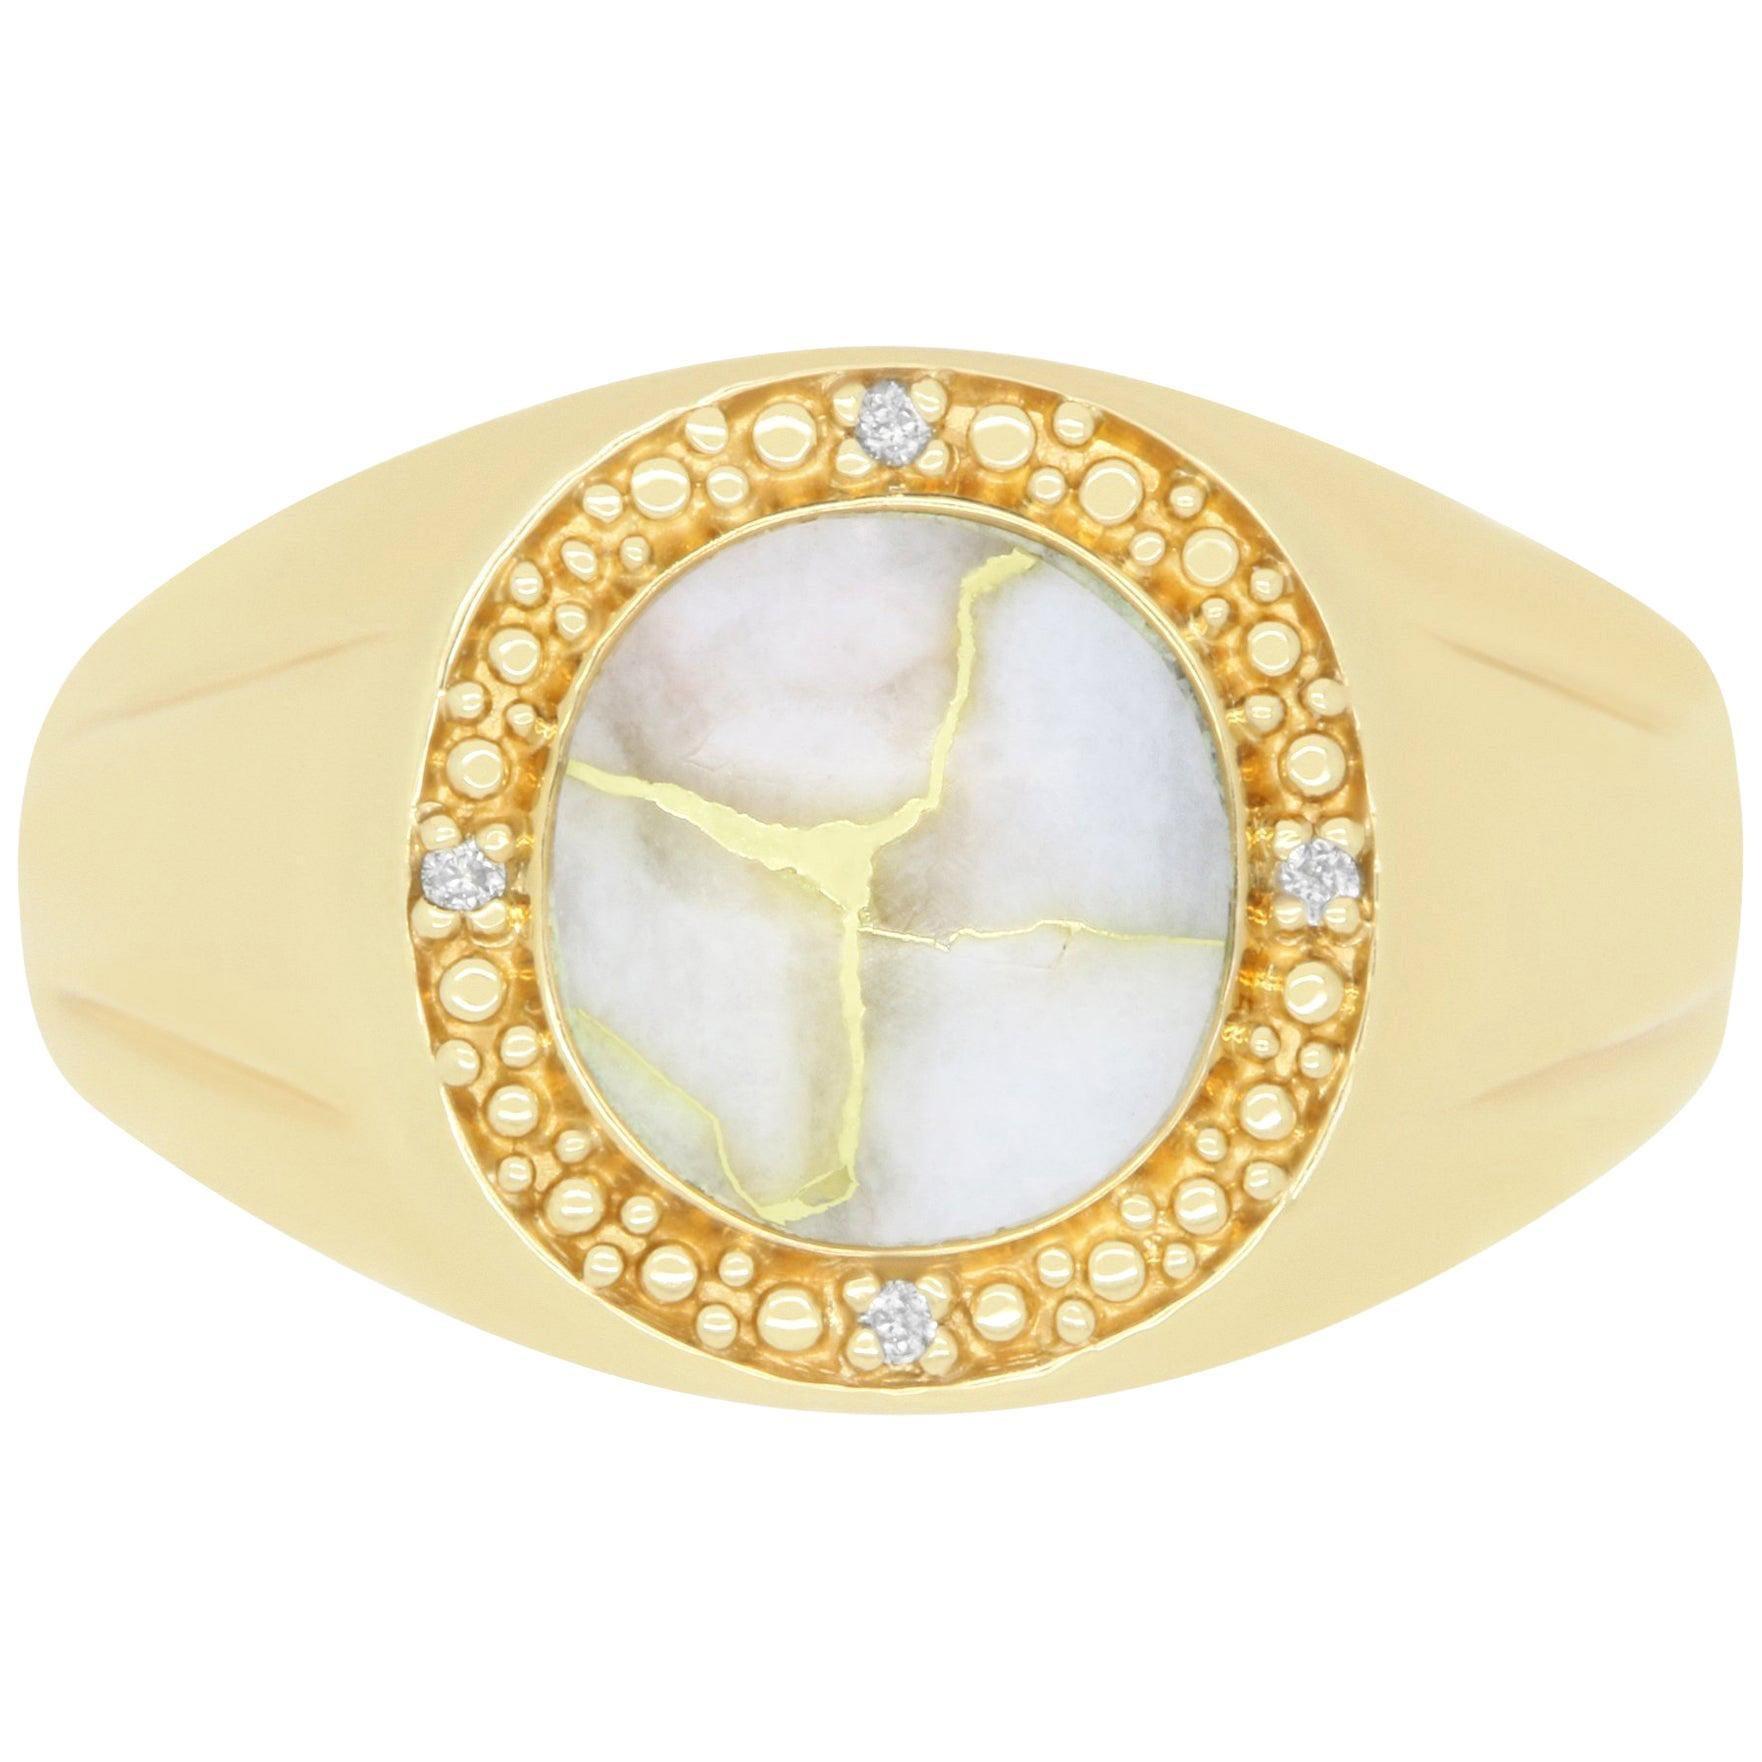 Gold in Quartz Diamond Unisex Men's Gent's Cocktail Dome Ring 14K Yellow